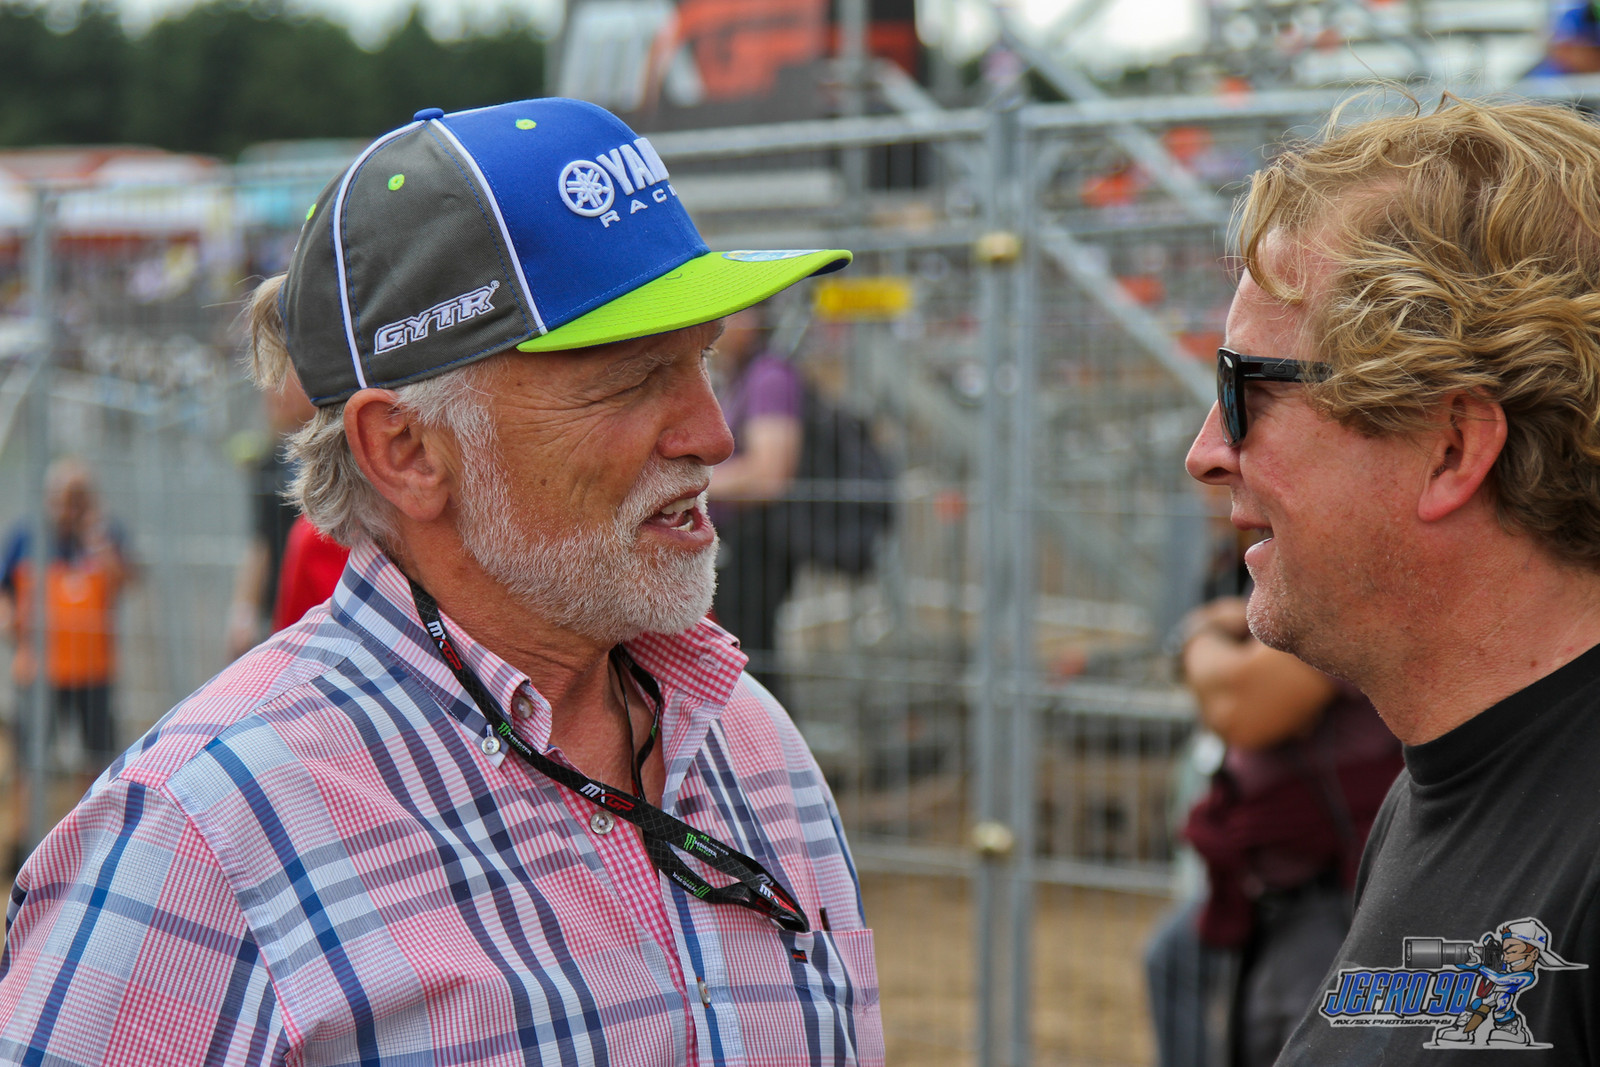 Pierre Karsmakers - Photo Gallery: MXGP of Limburg - Motocross Pictures - Vital MX